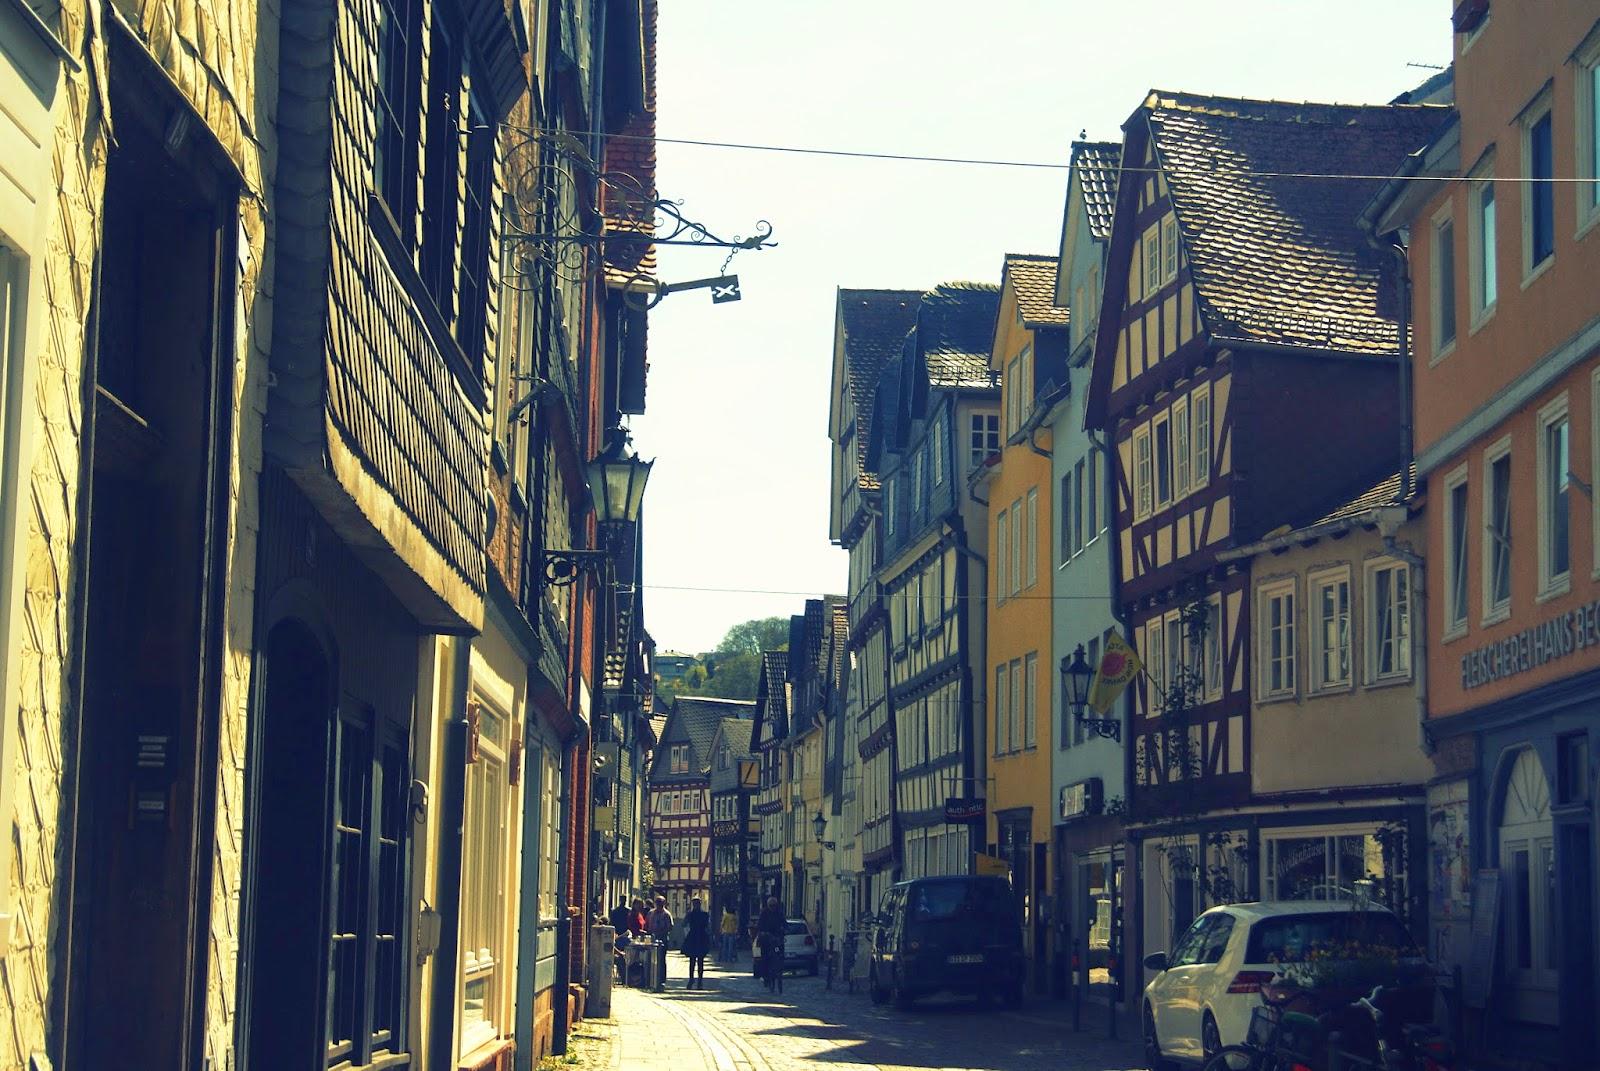 Marburg architecture